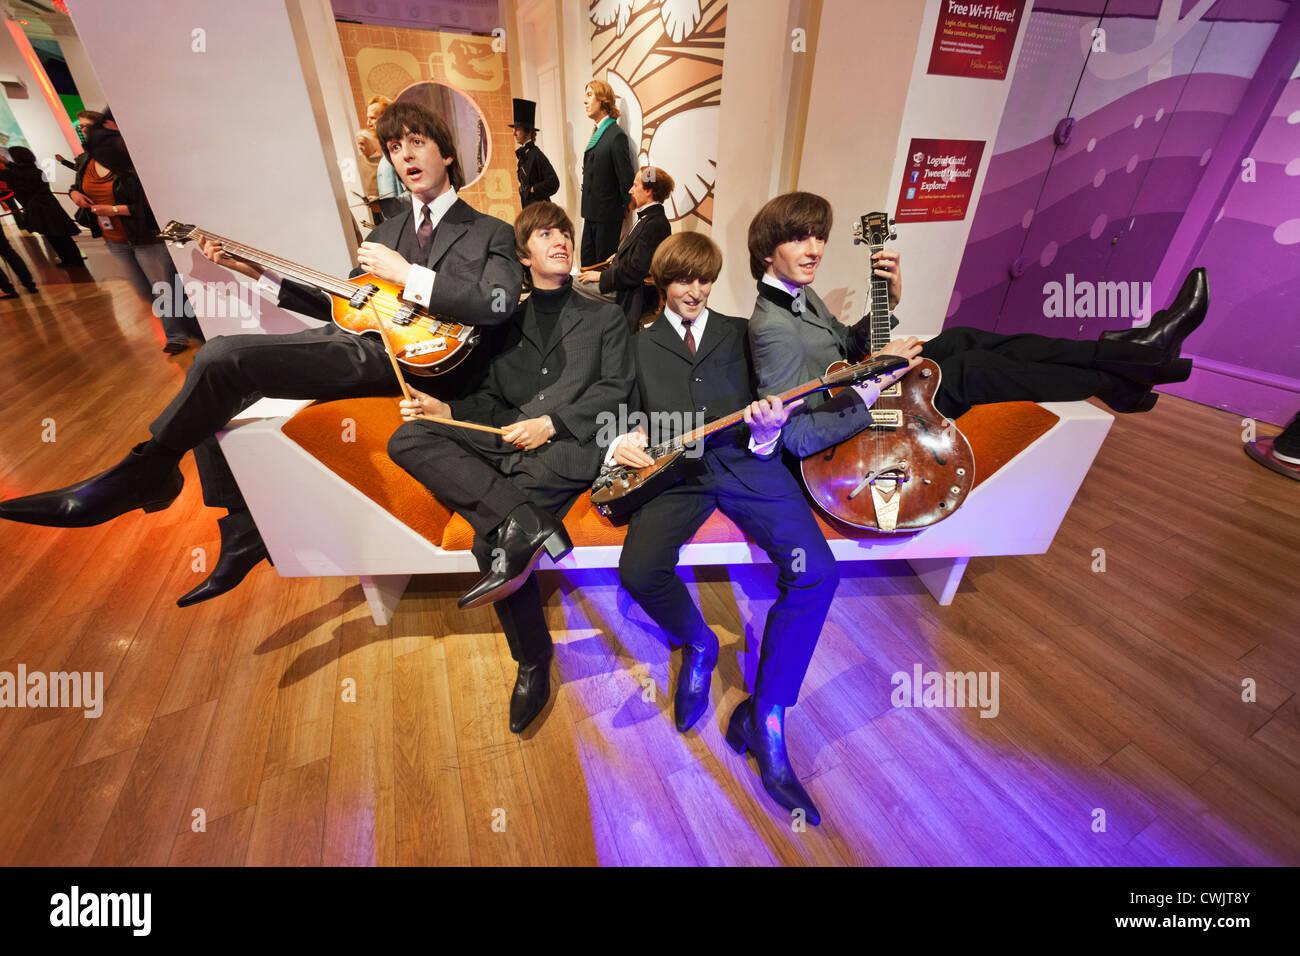 England, London, Madame Tussauds, Waxwork Display of The Beatles - Stock Image